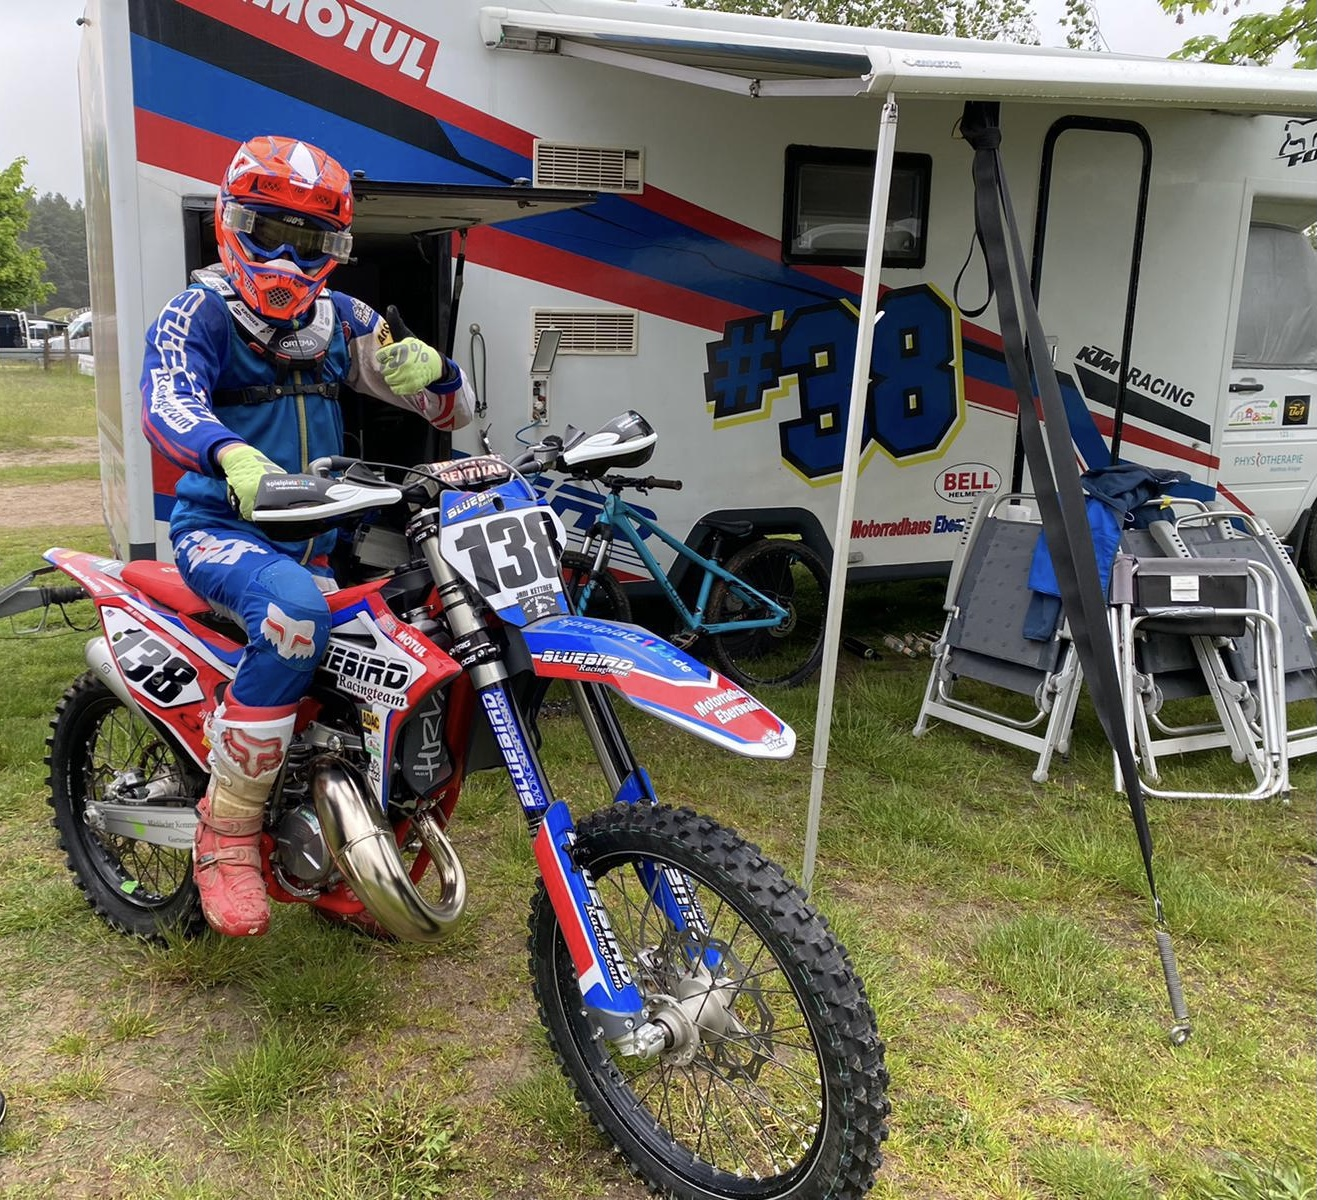 Motorrad 2021 Jan-Erik Kettner